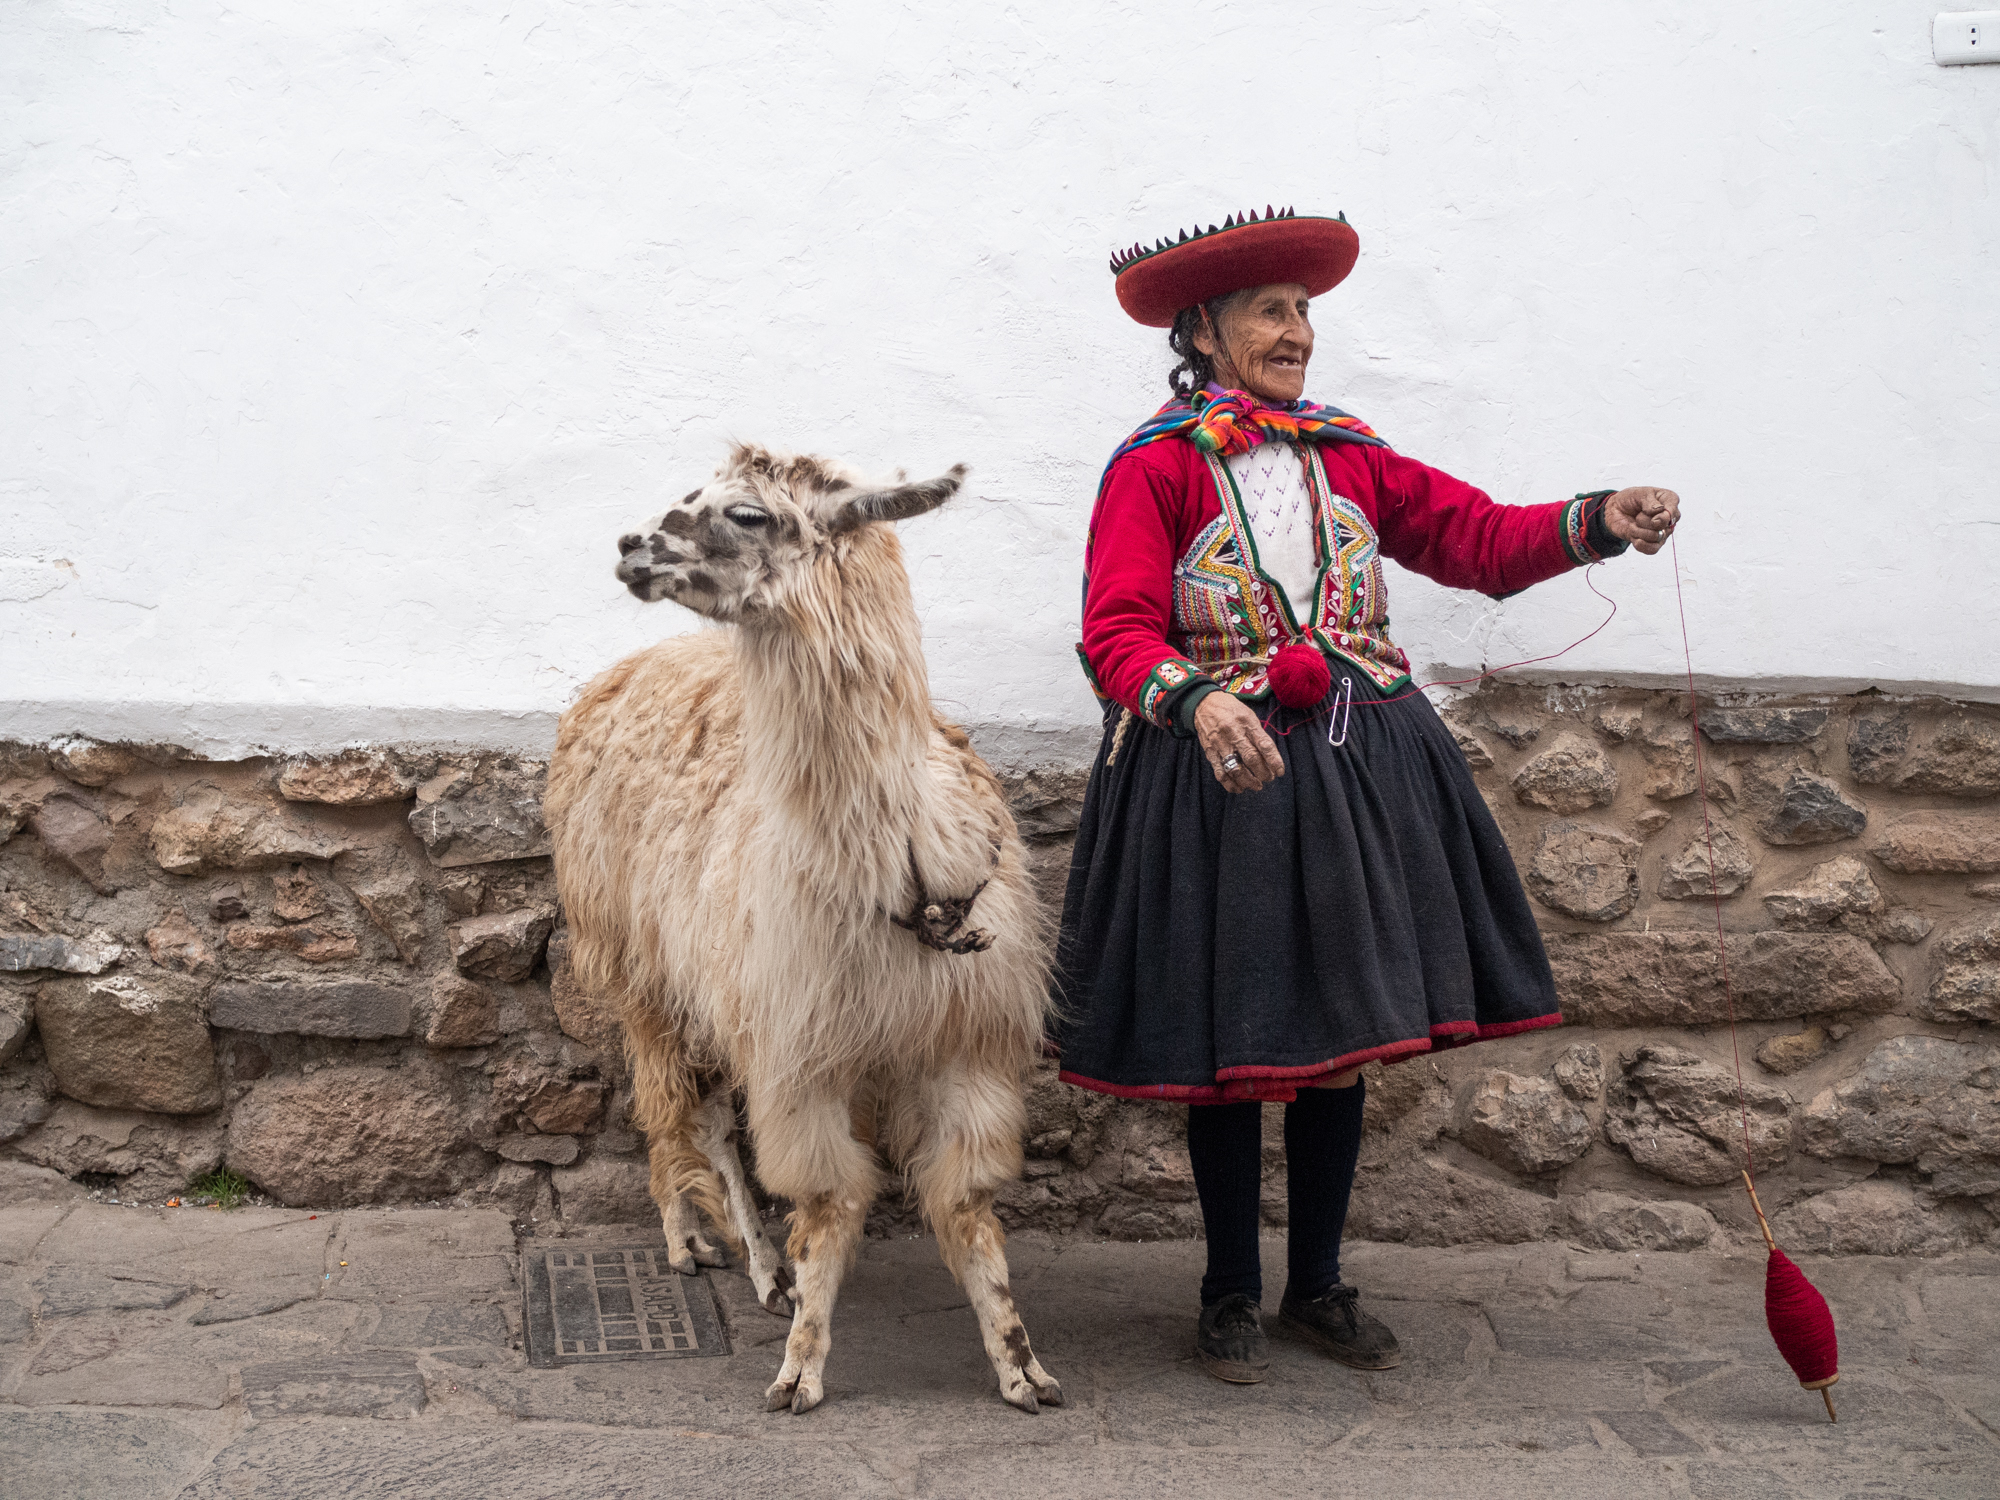 Peru-41923-Export.jpg